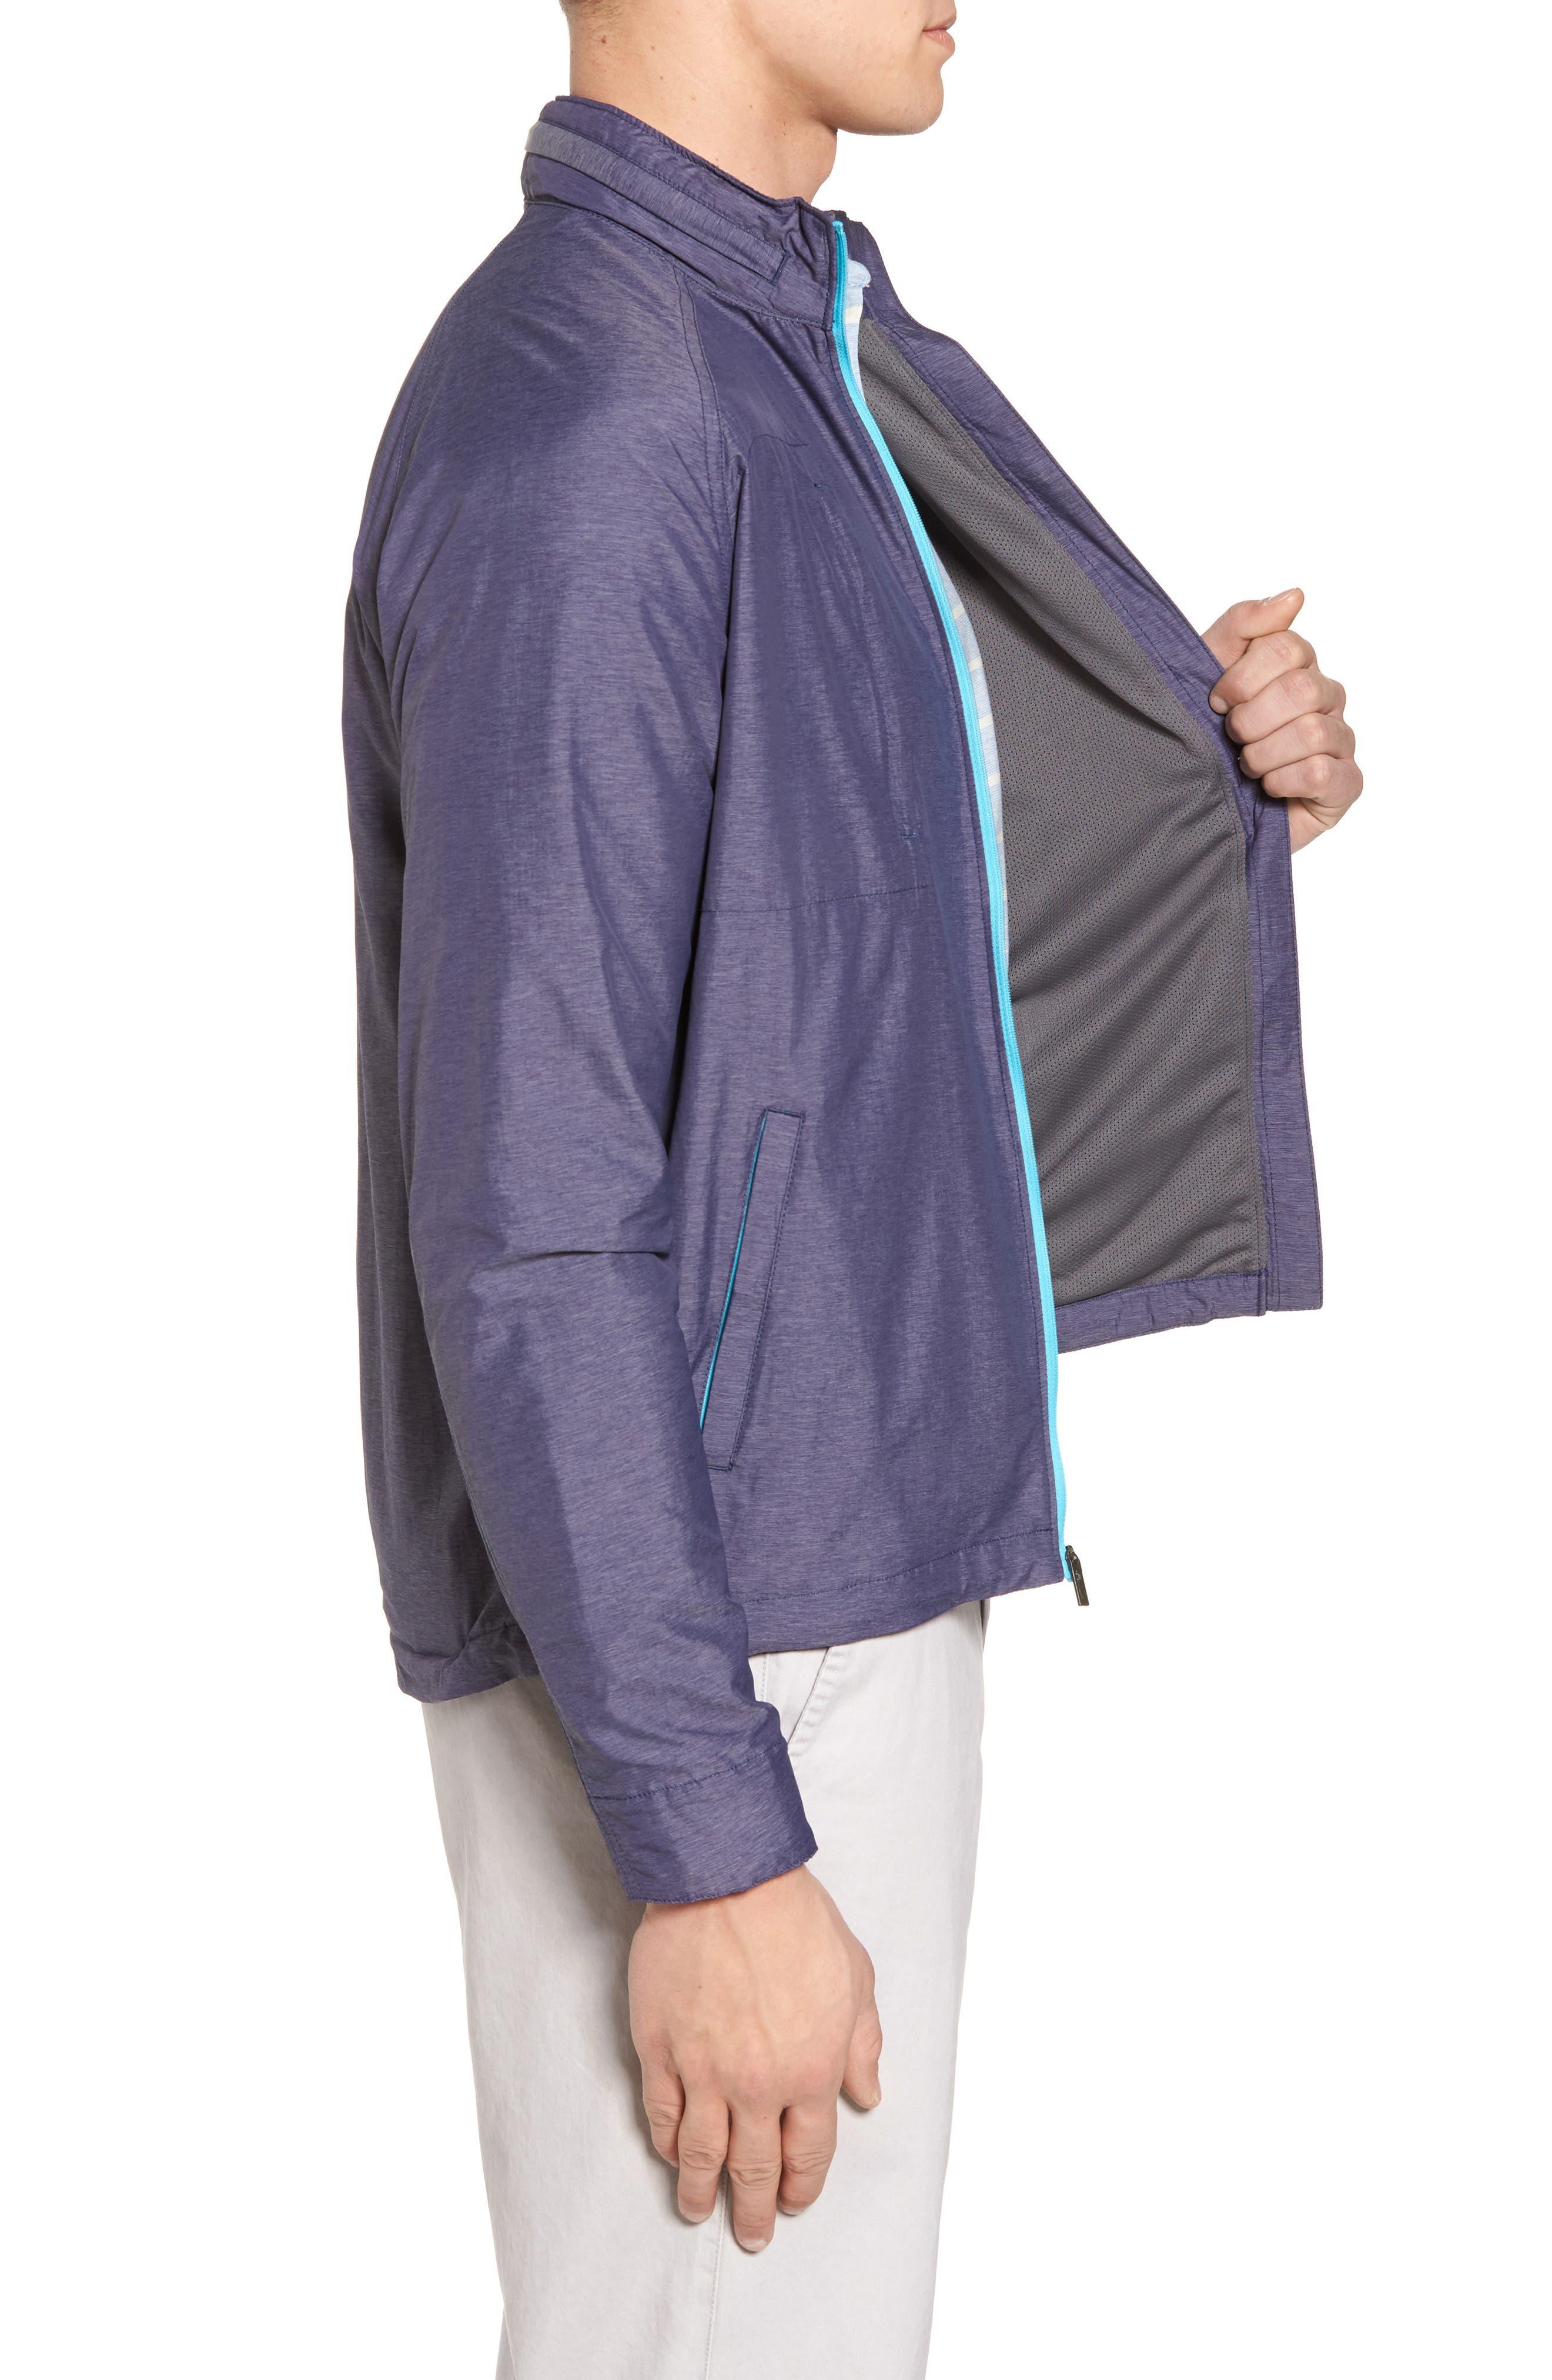 Nagano Windbreaker Jacket,                             Alternate thumbnail 6, color,